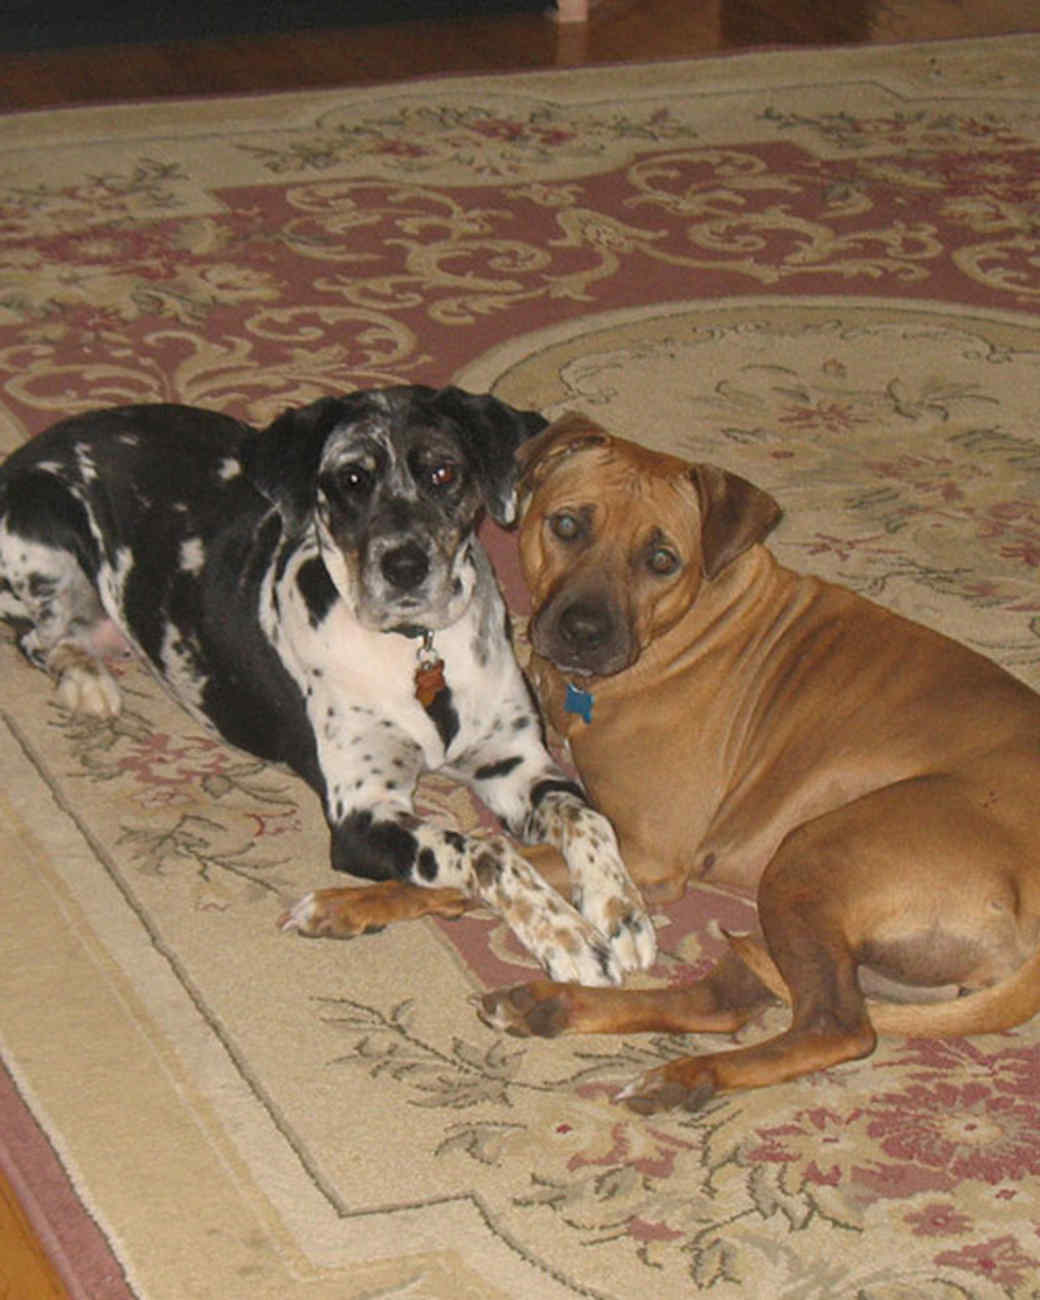 r_pets_kims_dogs_2.jpg